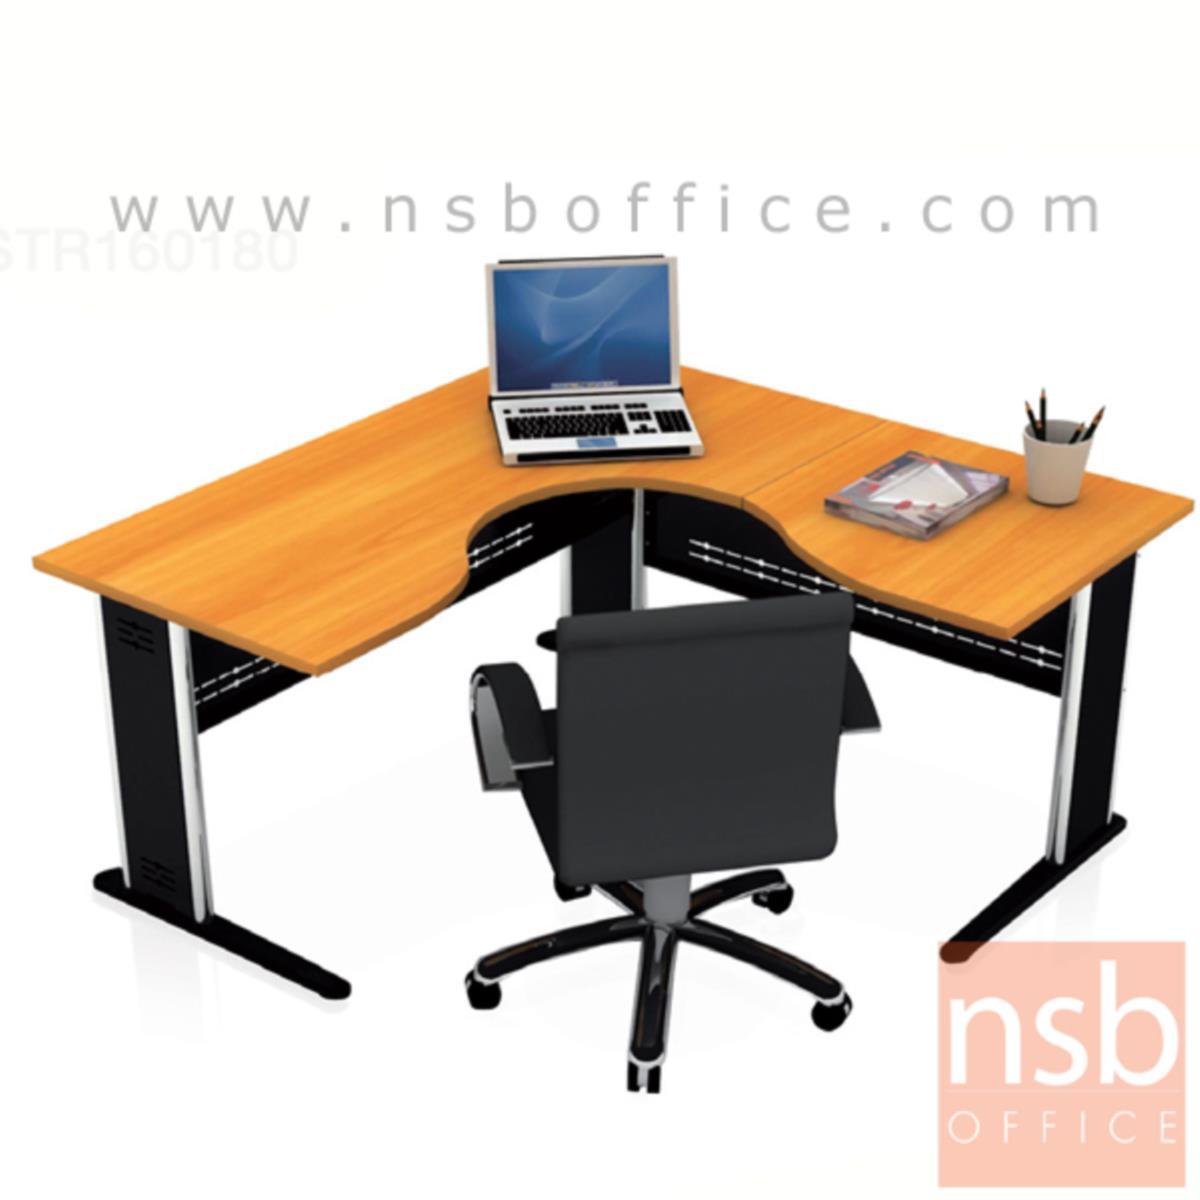 A06A002:โต๊ะผู้บริหารตัวแอลหน้าโค้งเว้า  รุ่น Andorian ขนาด 160W1 ,180W1*180W2 cm.  ขาเหล็ก